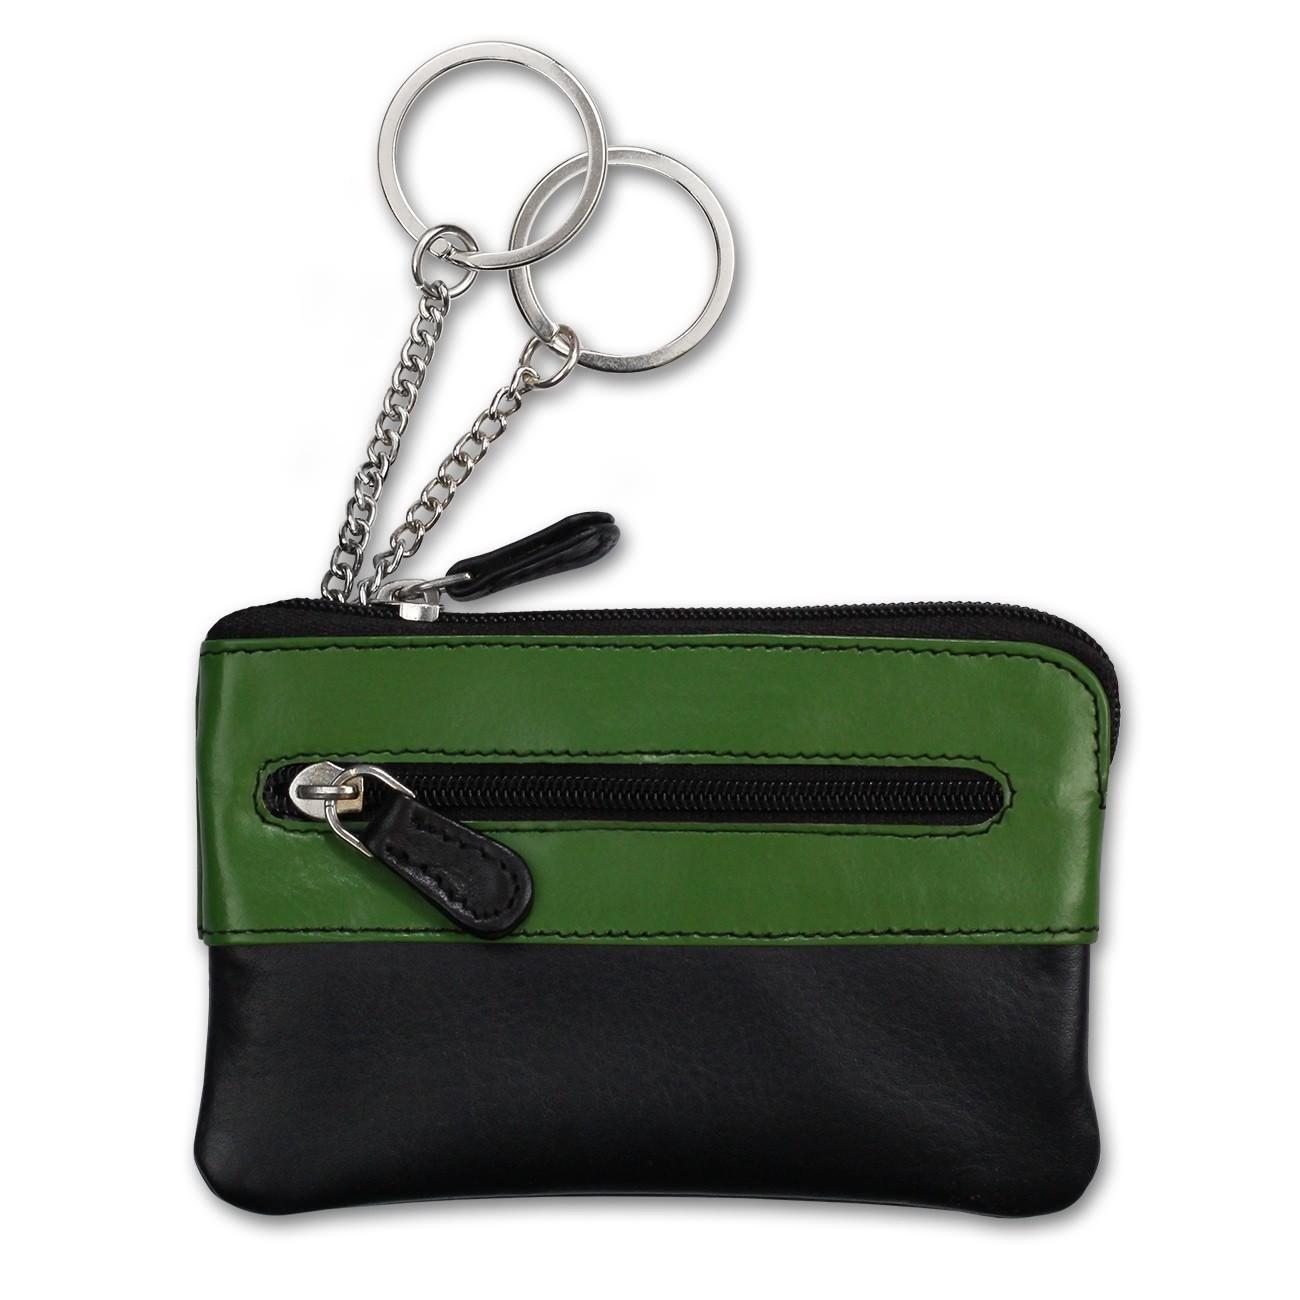 Schlüsseltasche Leder schwarz, grün Schlüsseletui Minibörse DrachenLeder OPS905G